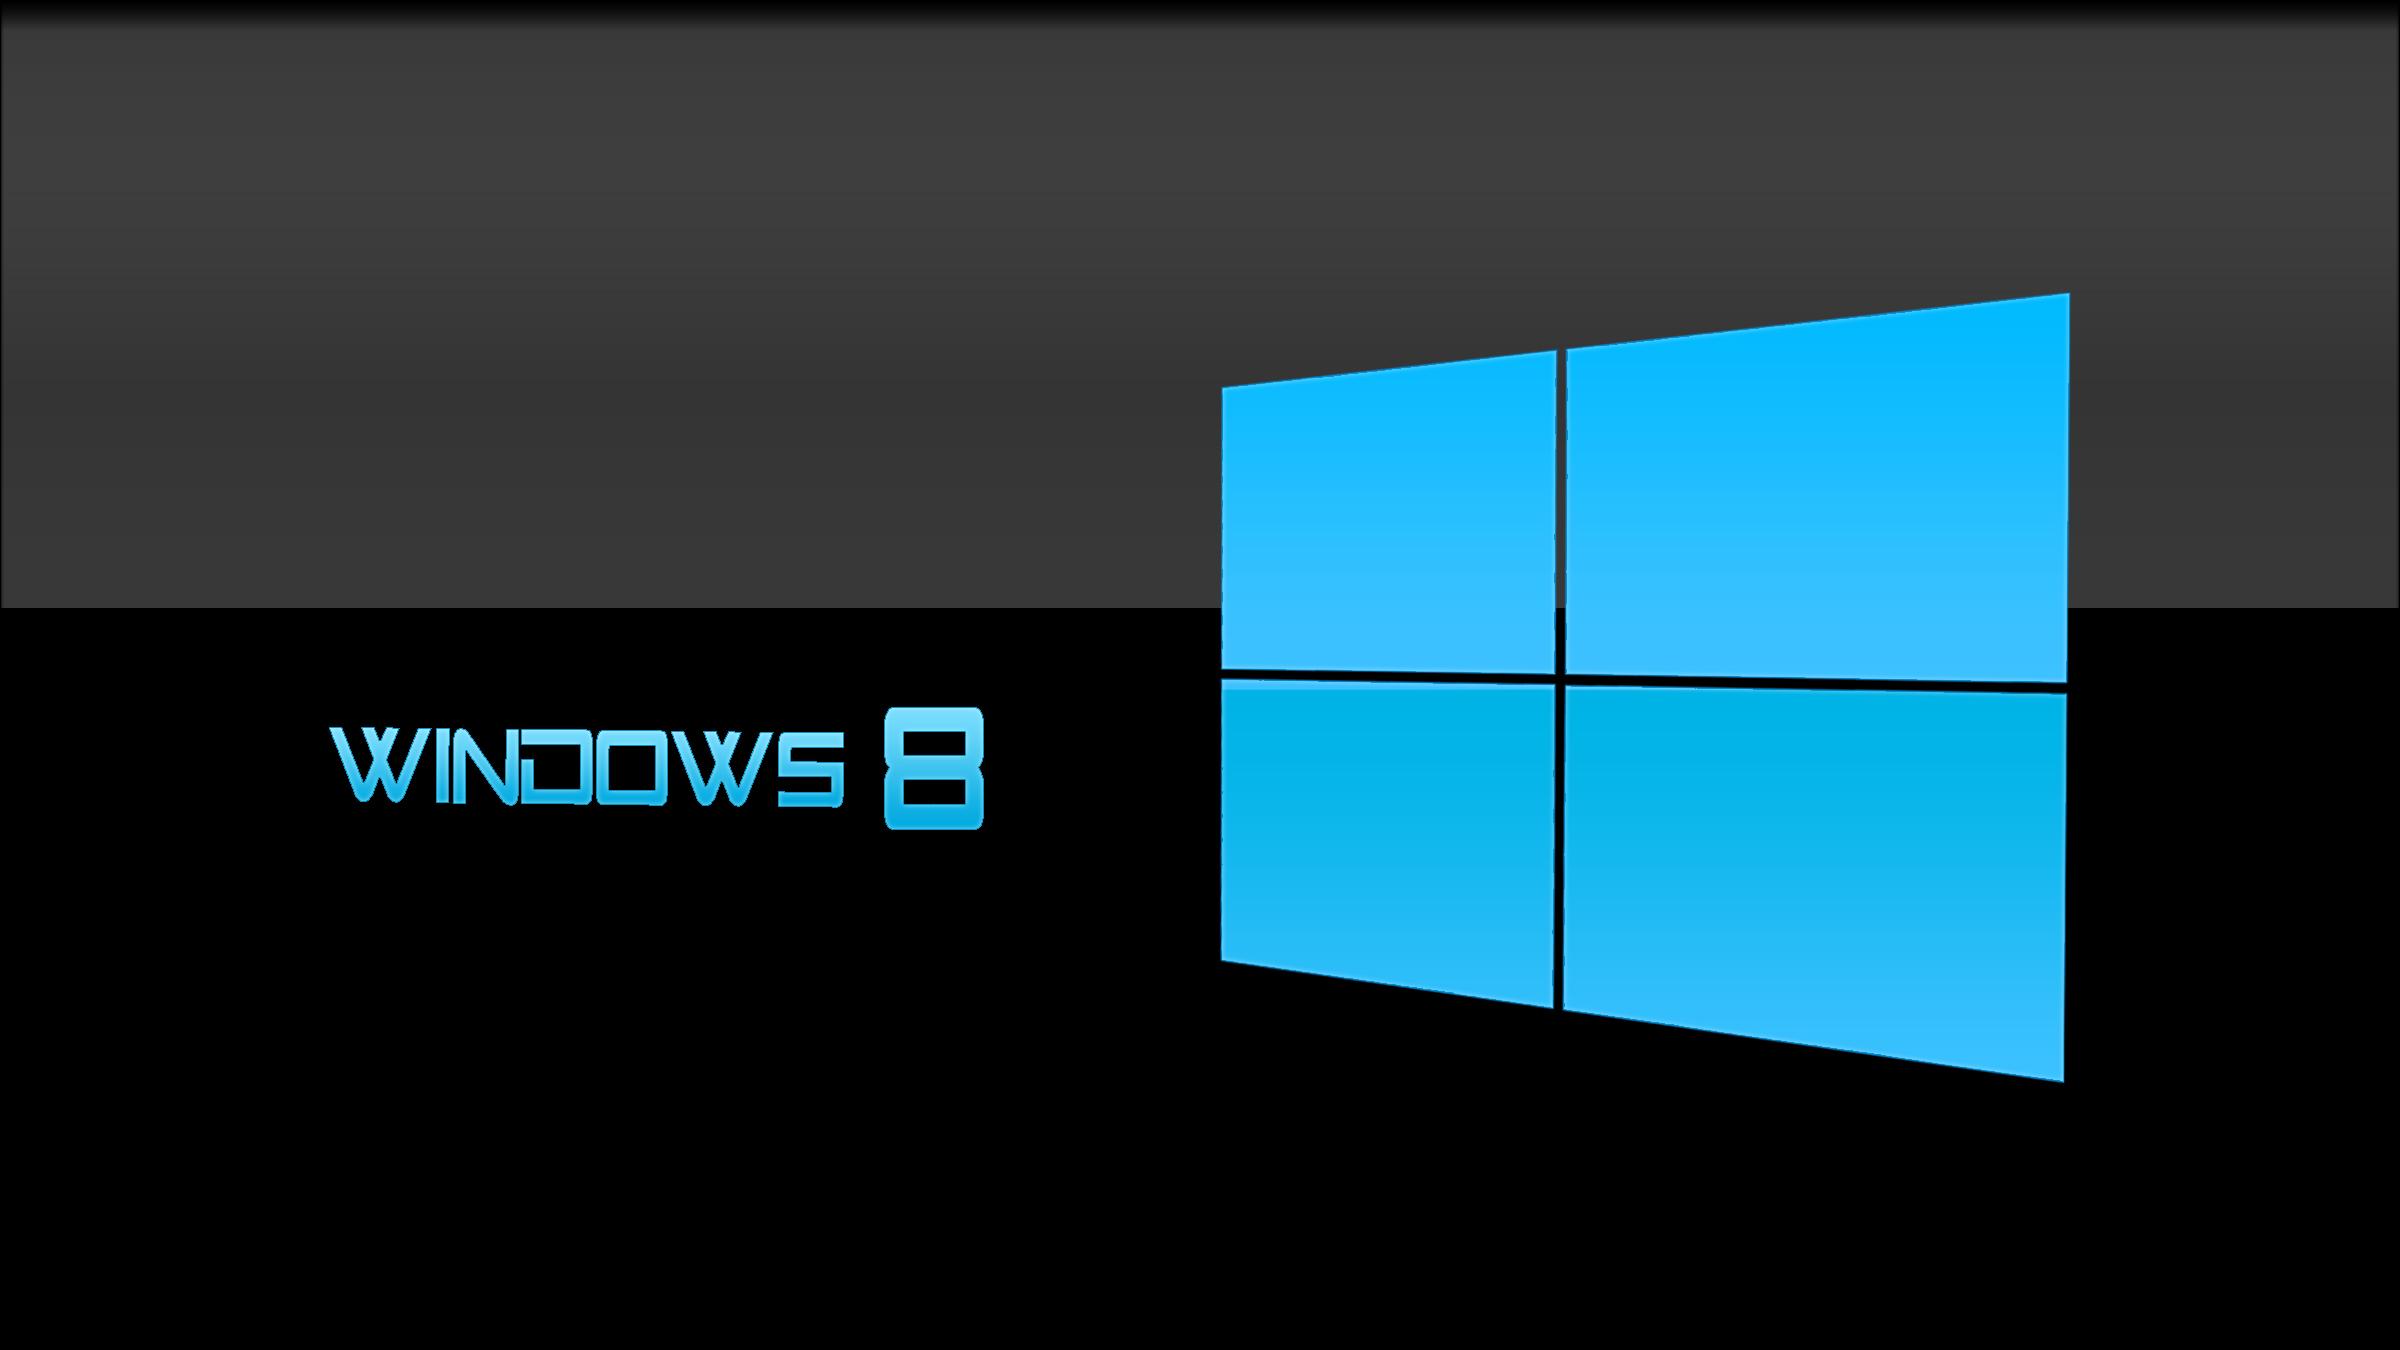 logo windows 8 black - photo #22